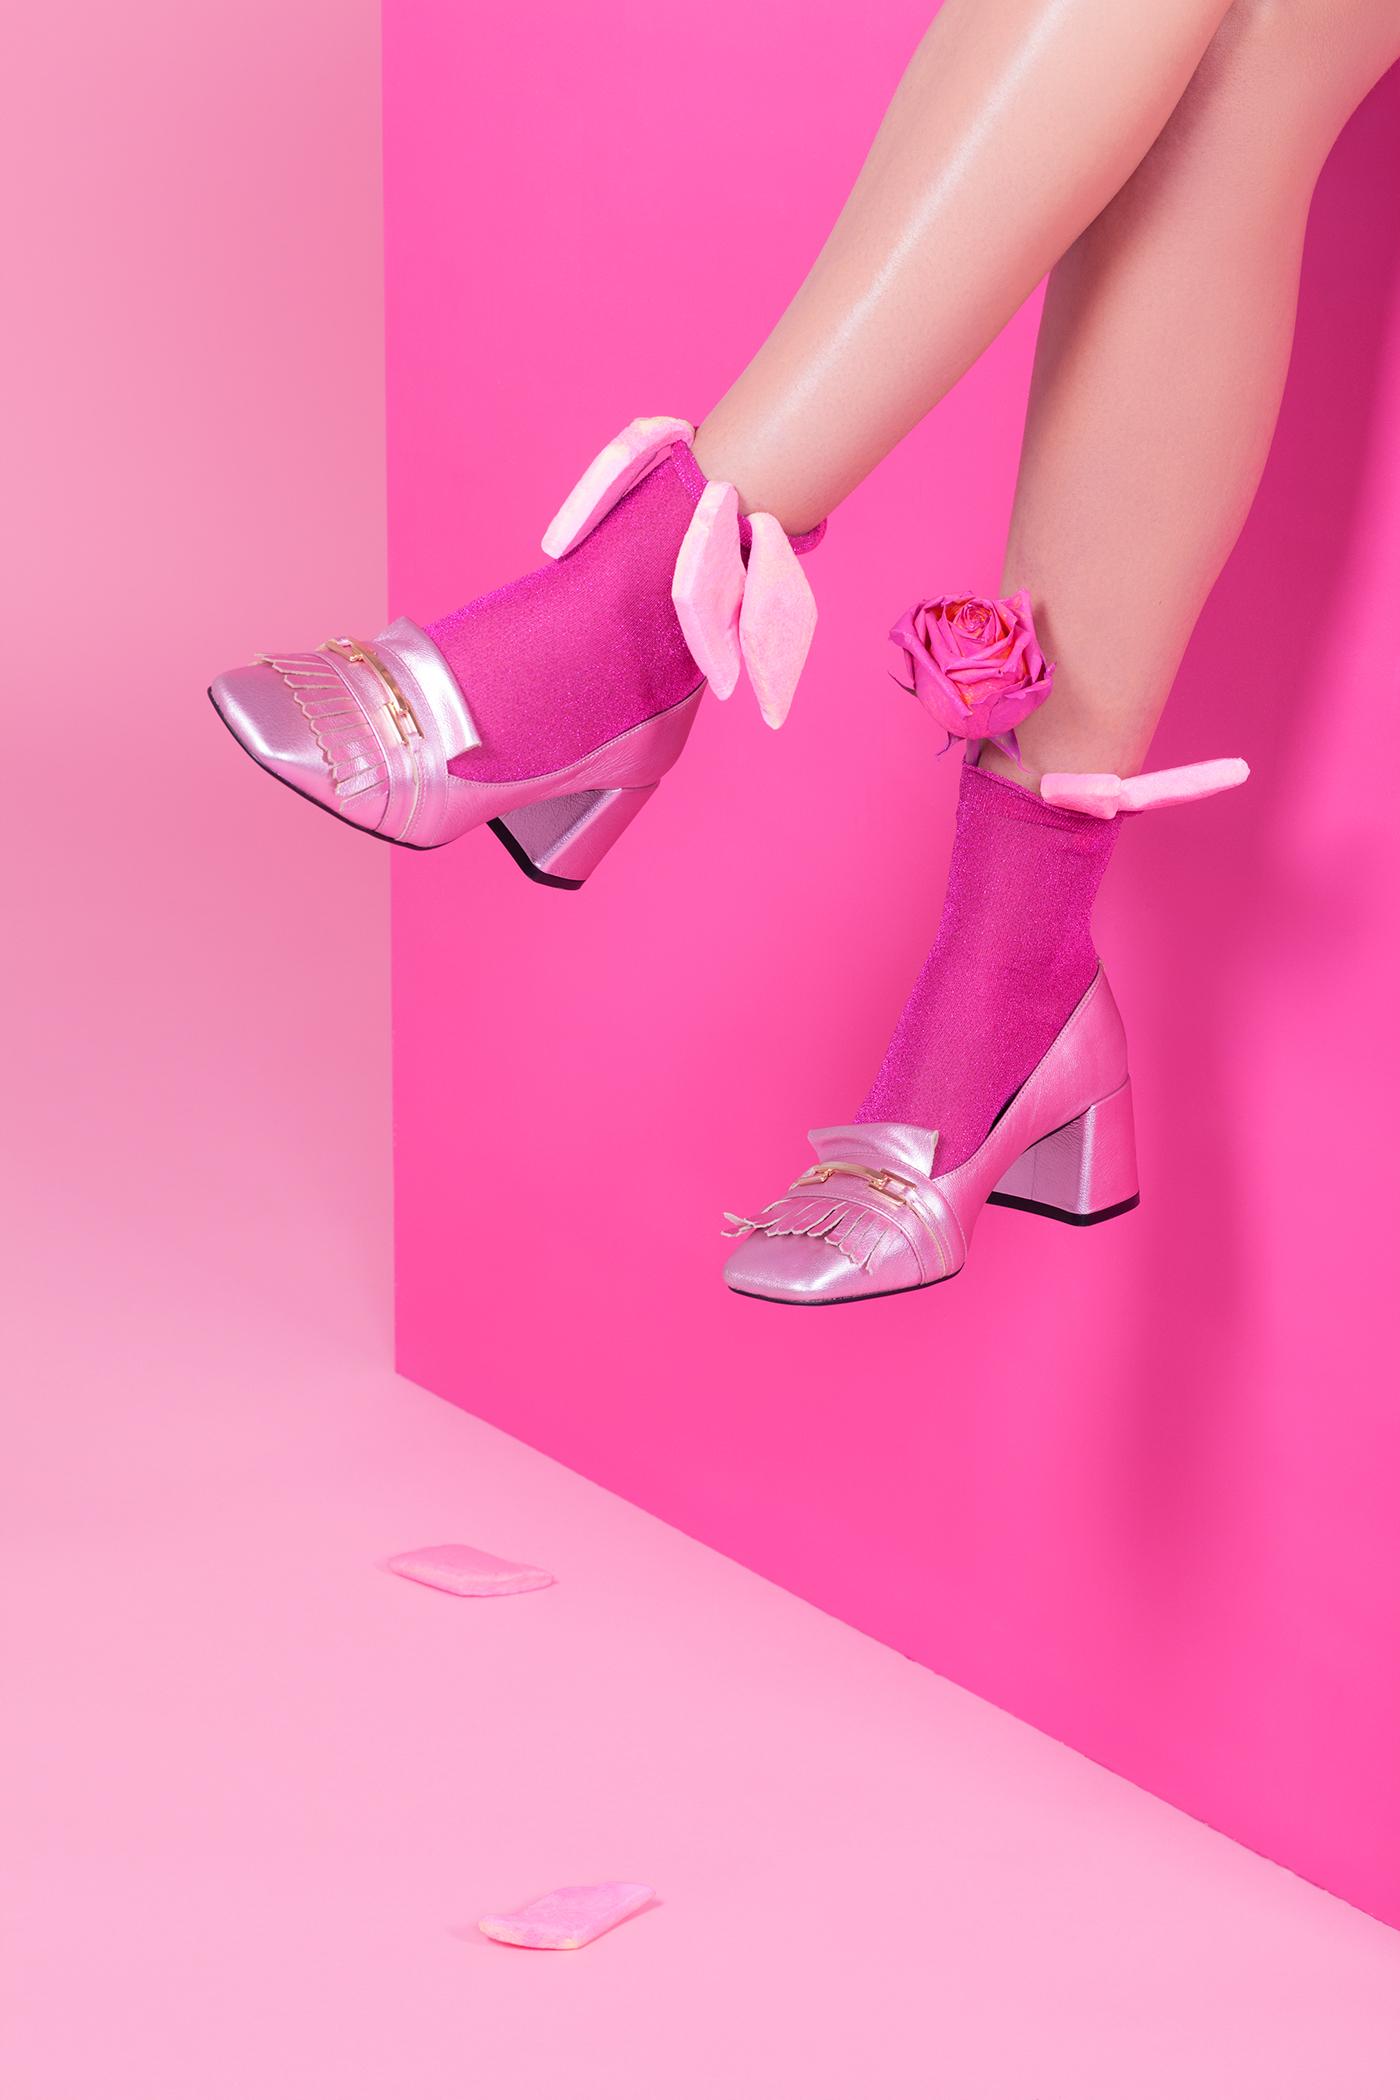 Pink Paper / фотограф Michiel Spijkers